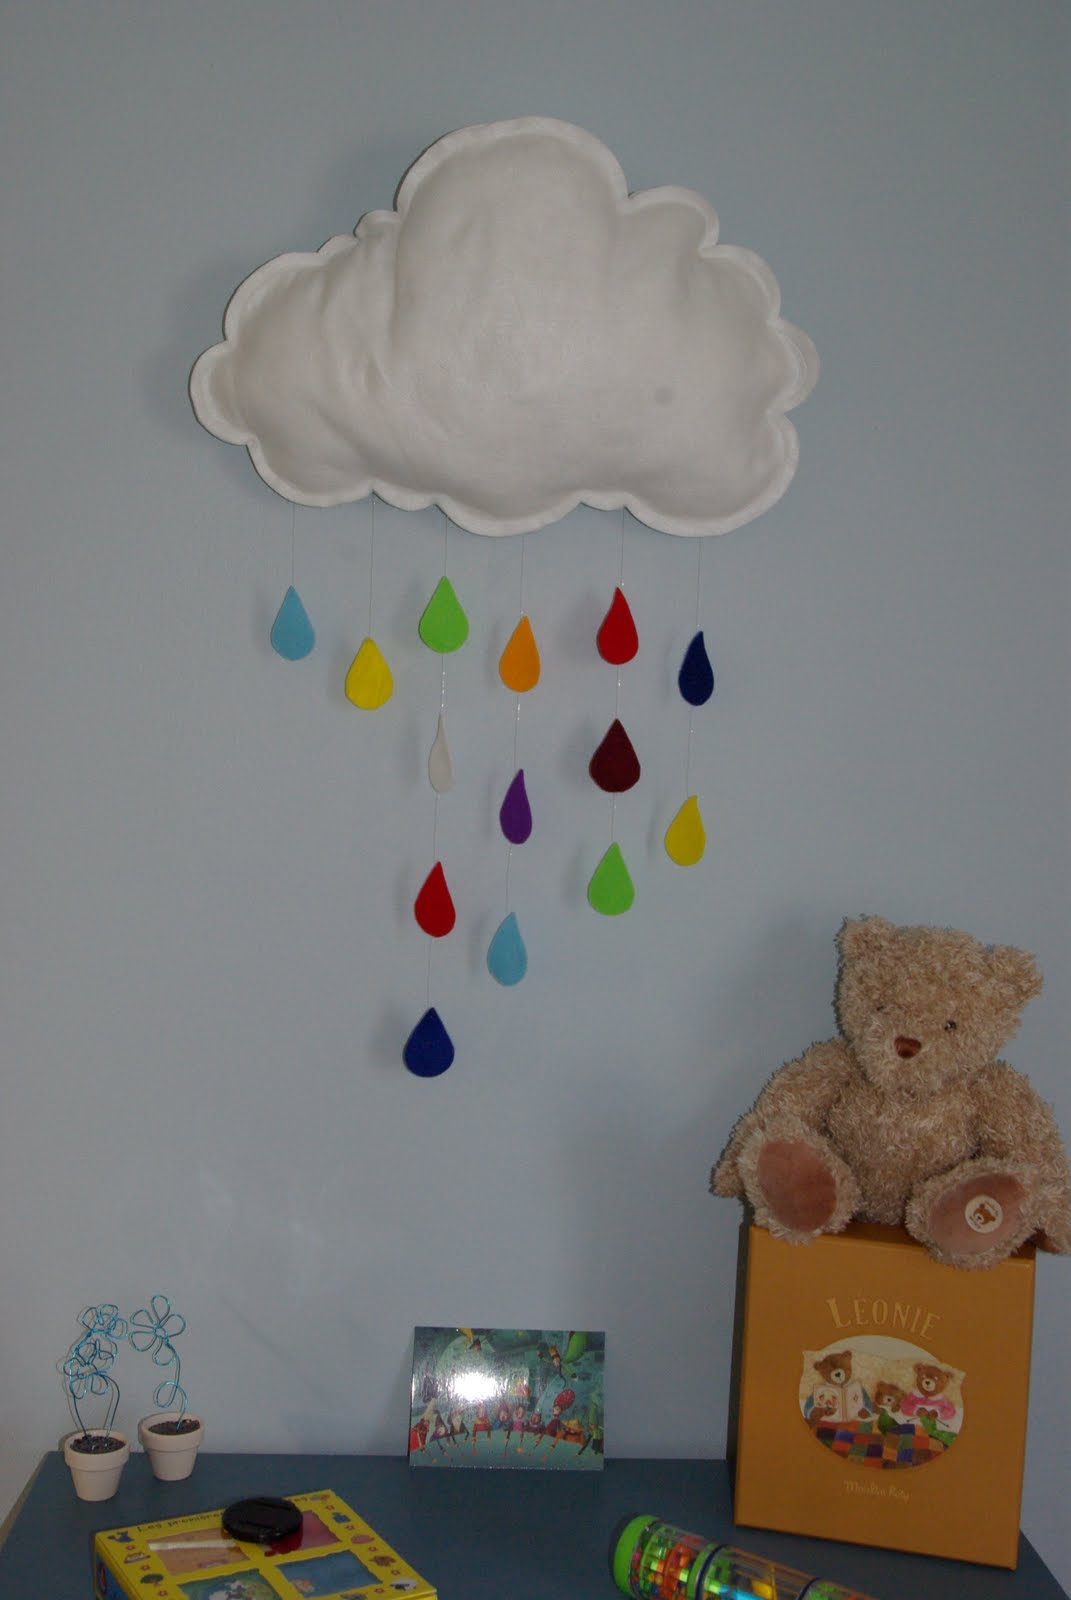 So 39 home made une douce pluie for Coudre a imparfait